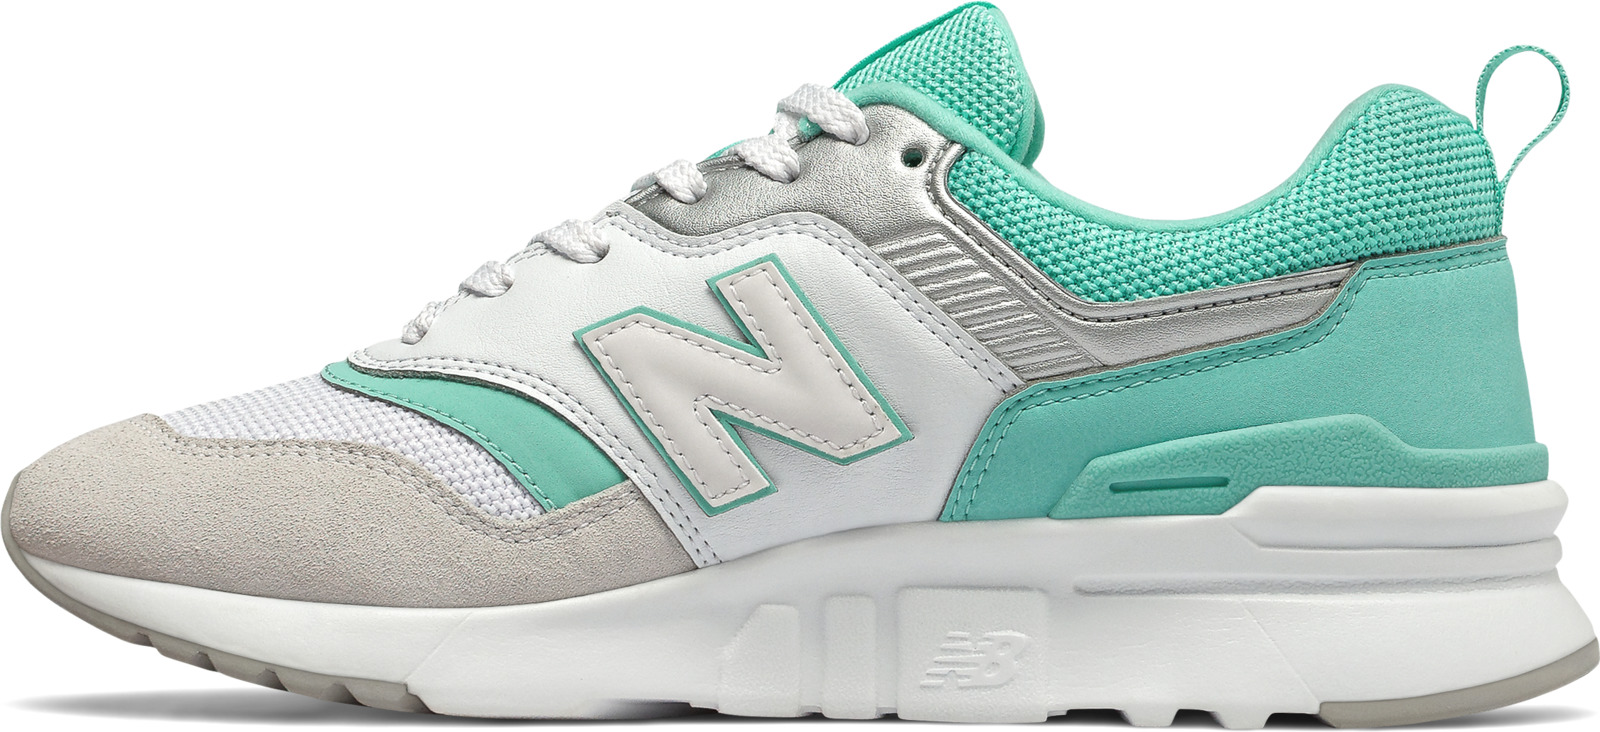 Фото - Кроссовки New Balance 997 кроссовки женские new balance 997 цвет бежевый cw997hna b размер 7 36 5